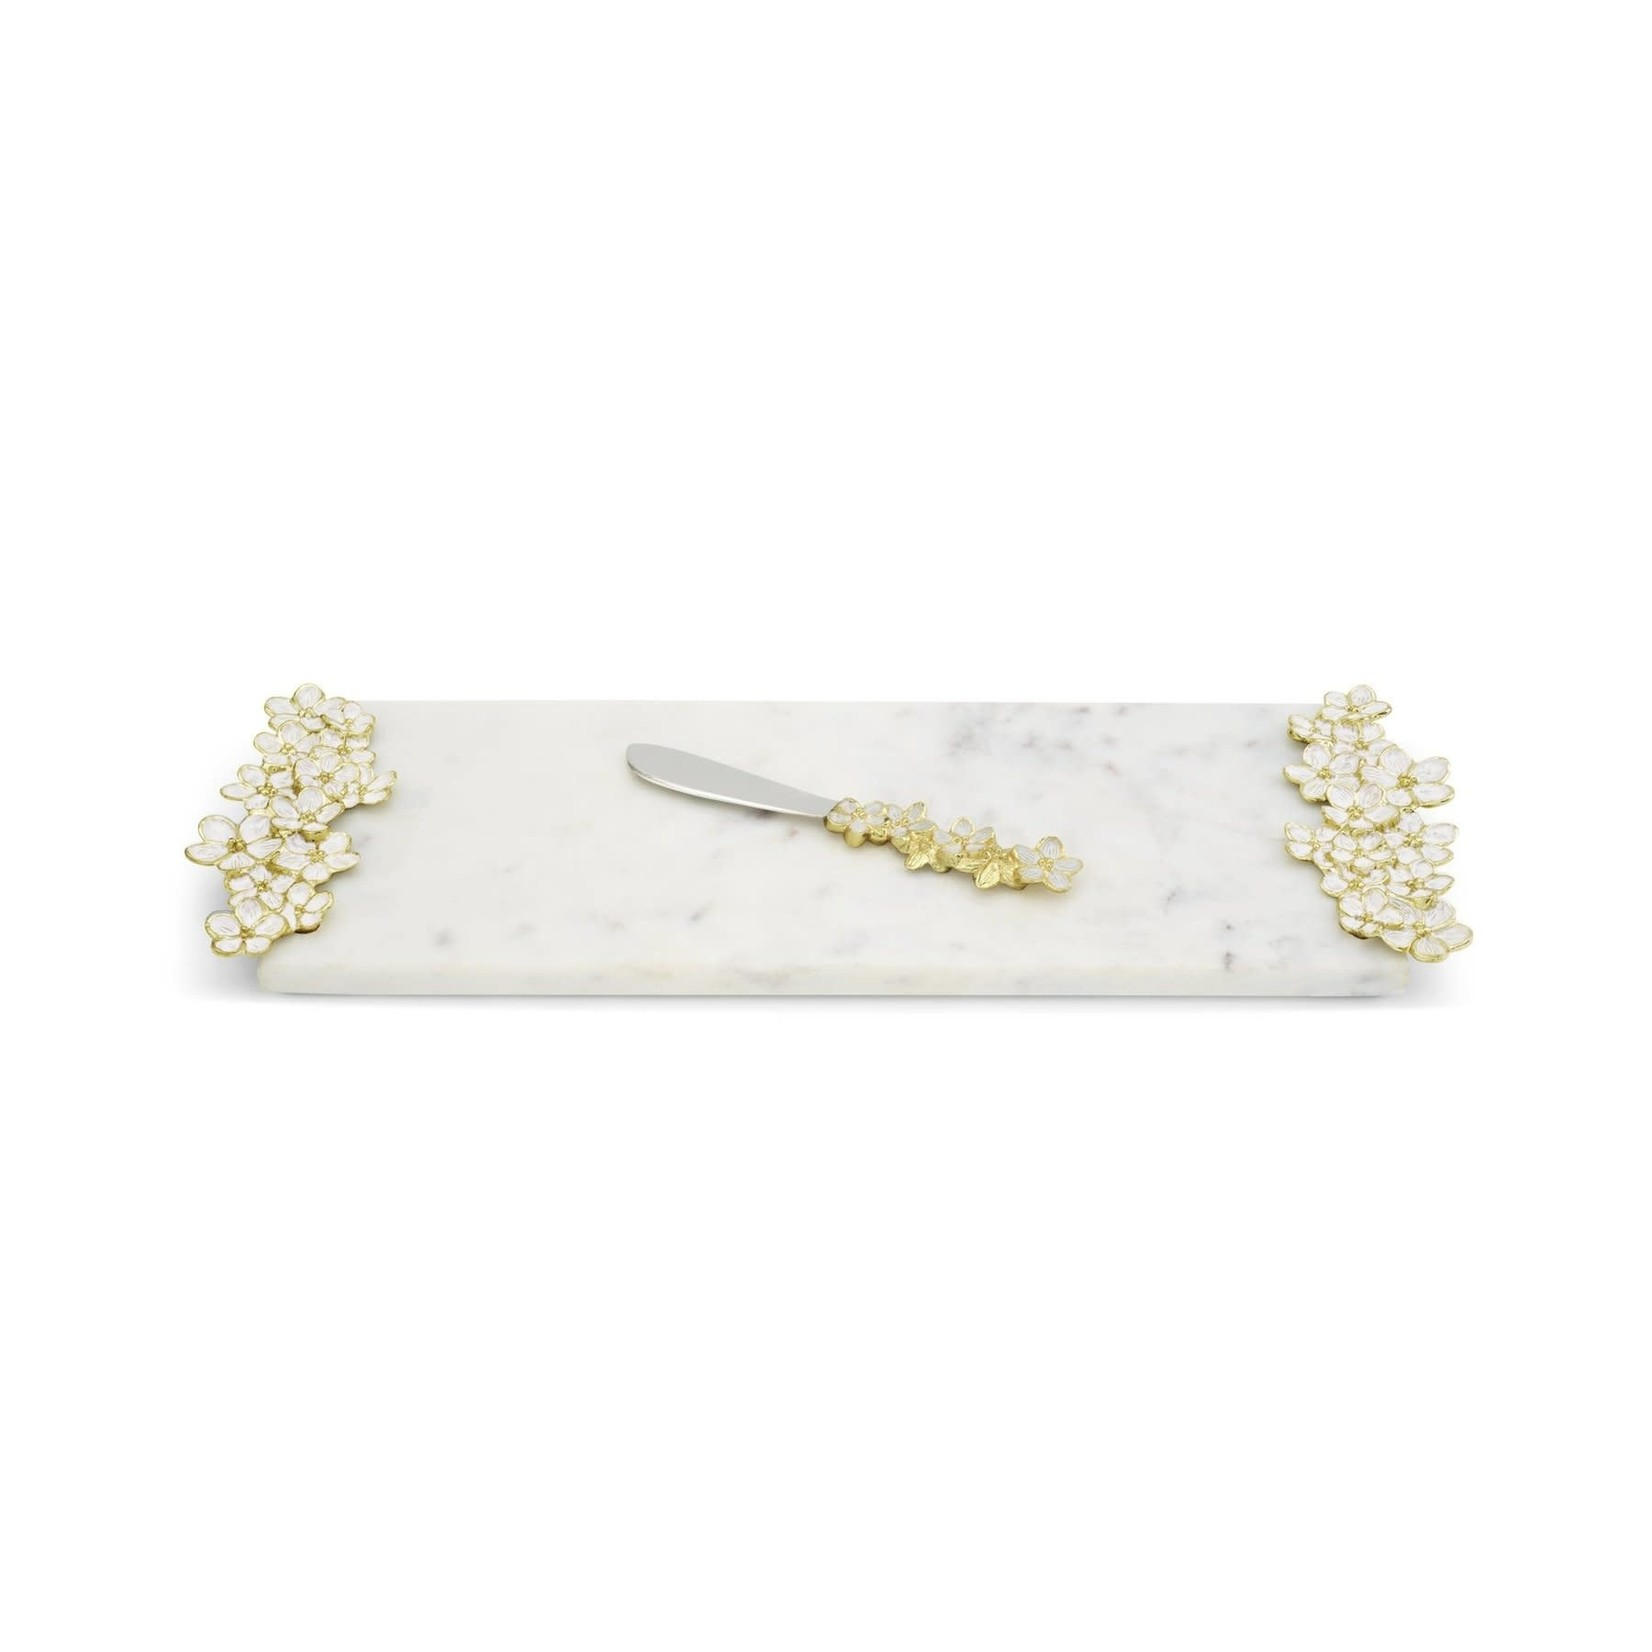 Michael Aram Cherry Blossom Small Cheeseboard/Knife